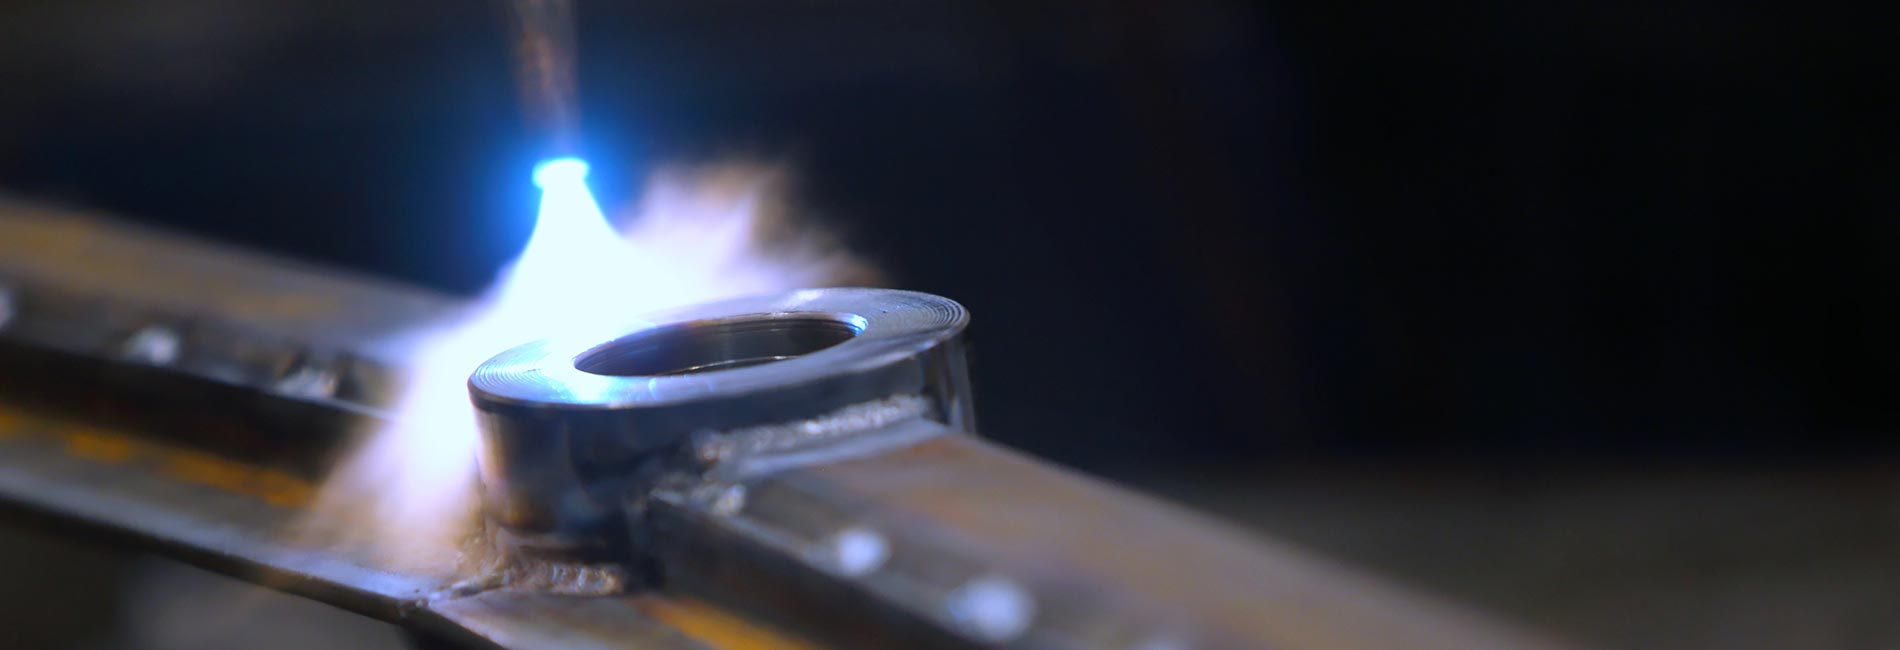 GN_KNIT obrobka metali